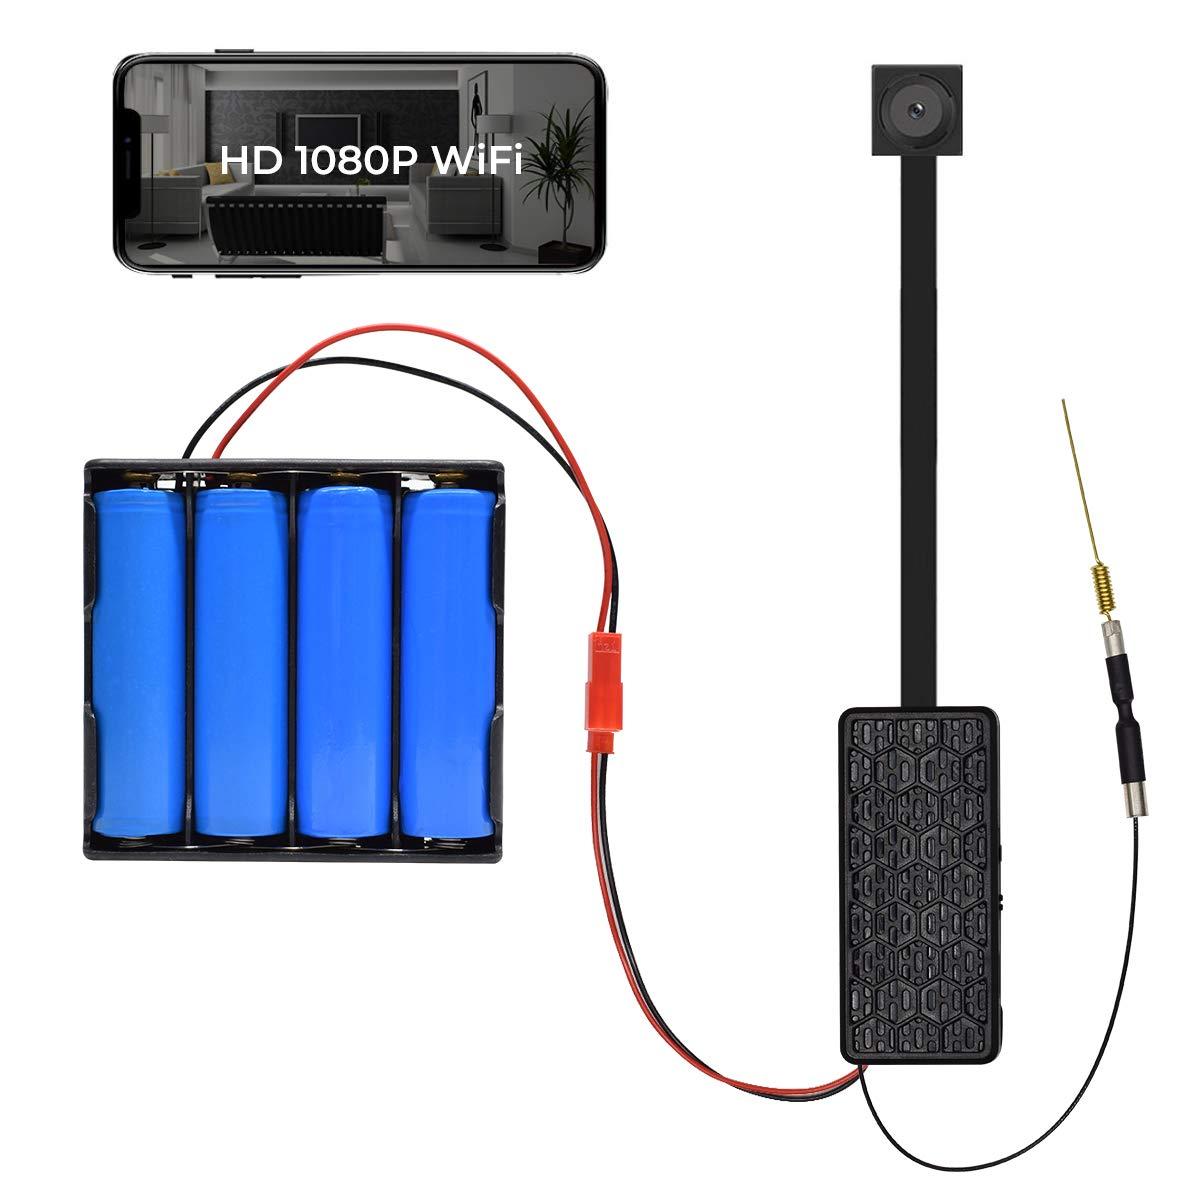 Spy Camera Module Wireless Hidden Camera WiFi Mini Cam HD 1080P DIY Tiny Cams Small Nanny Cameras Home Security Live Streaming Via Android/iOS/PC App Motion Detection Alerts